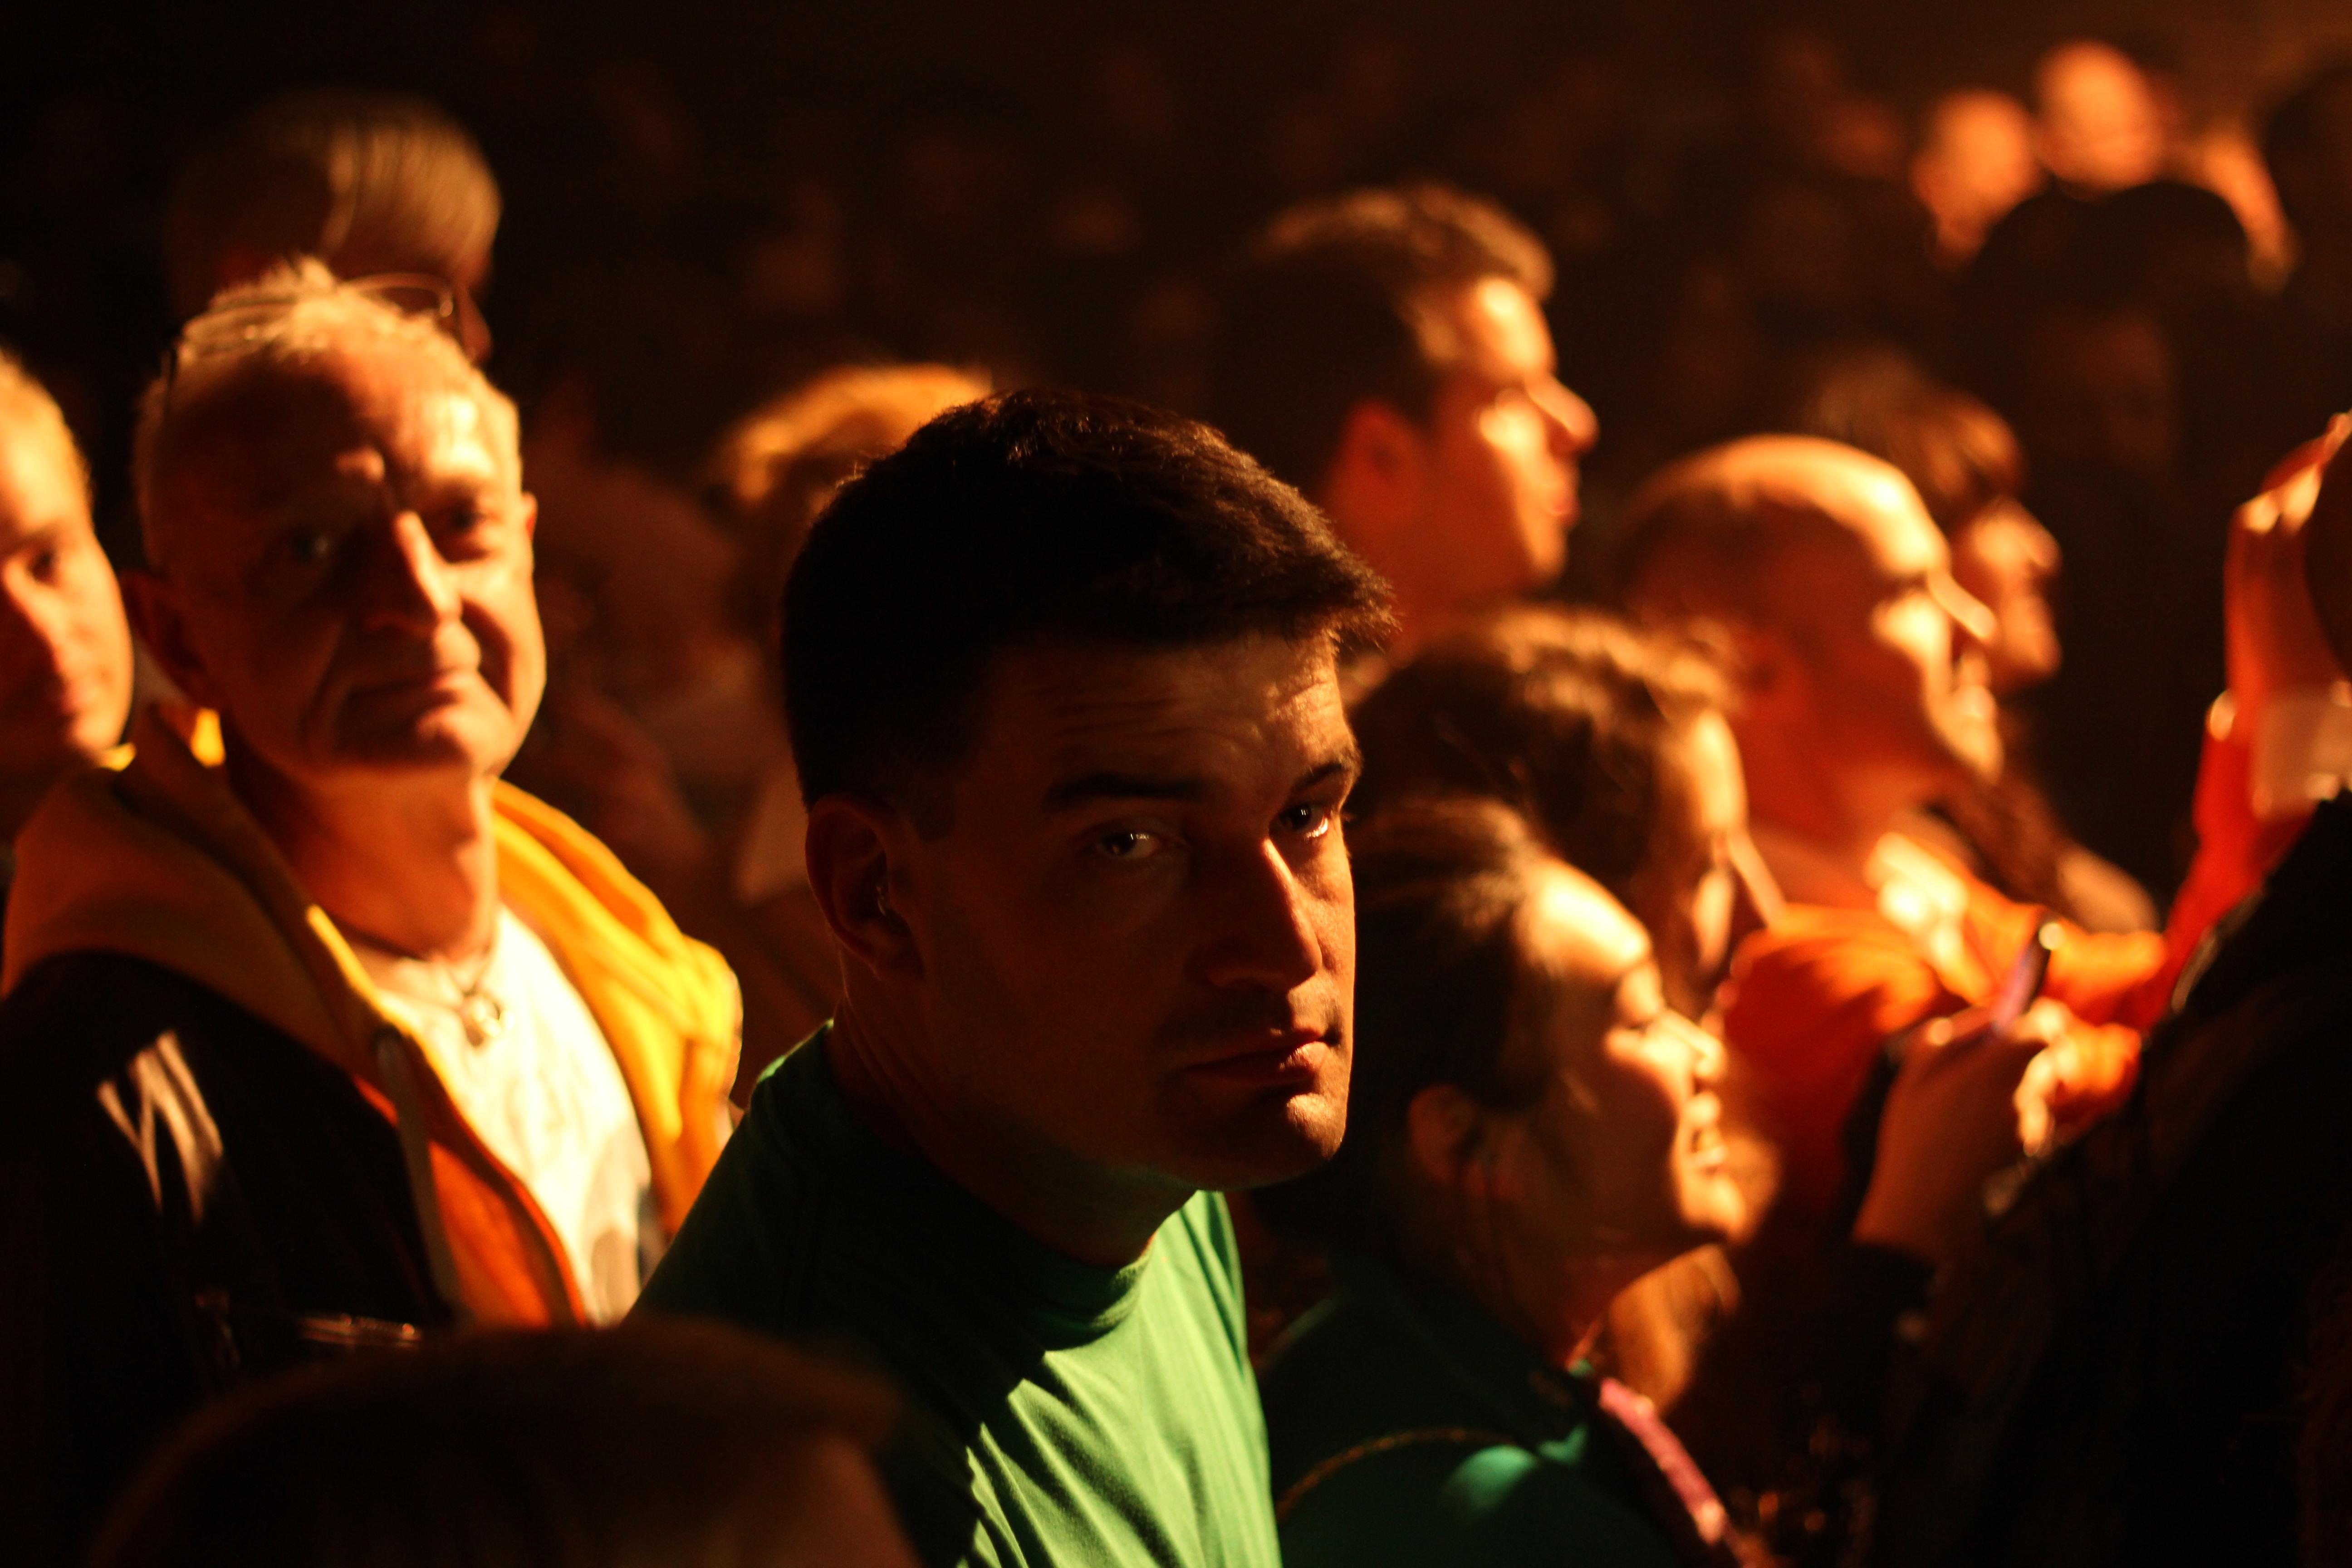 Crowd | 2013